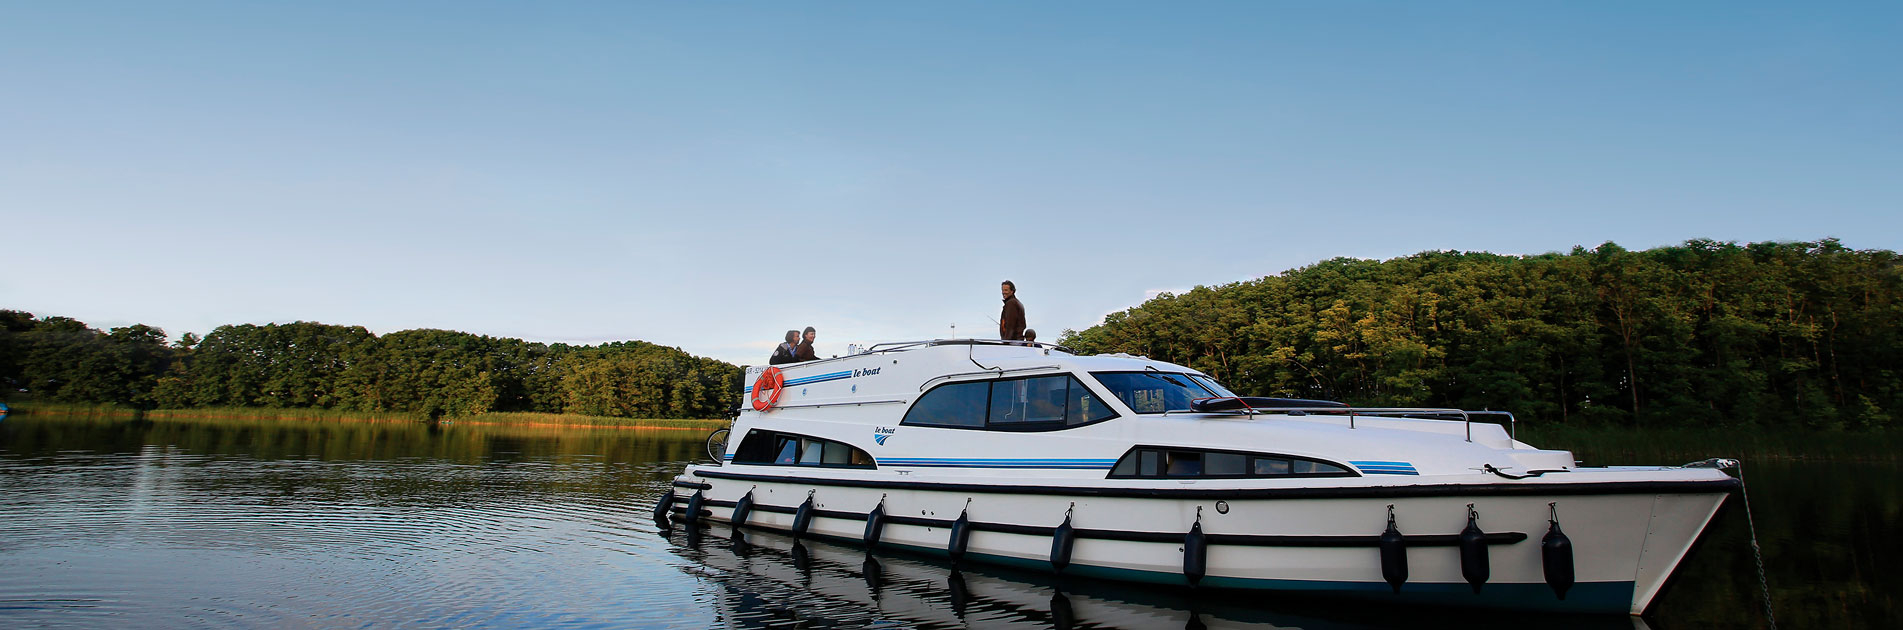 Flodbåd i Brandenburg